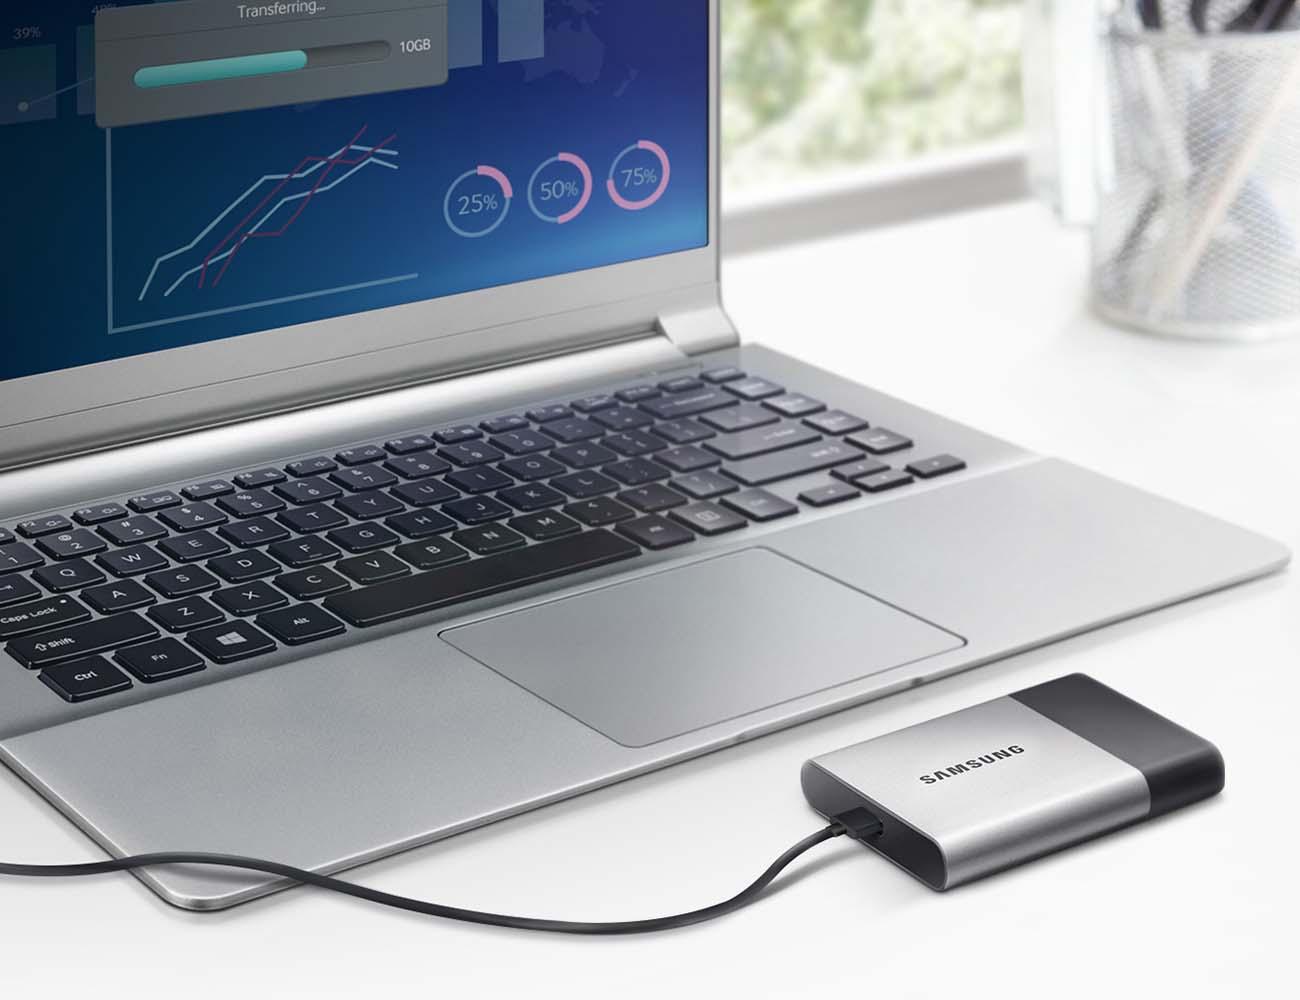 2TB Samsung Portable SSD External Storage Device